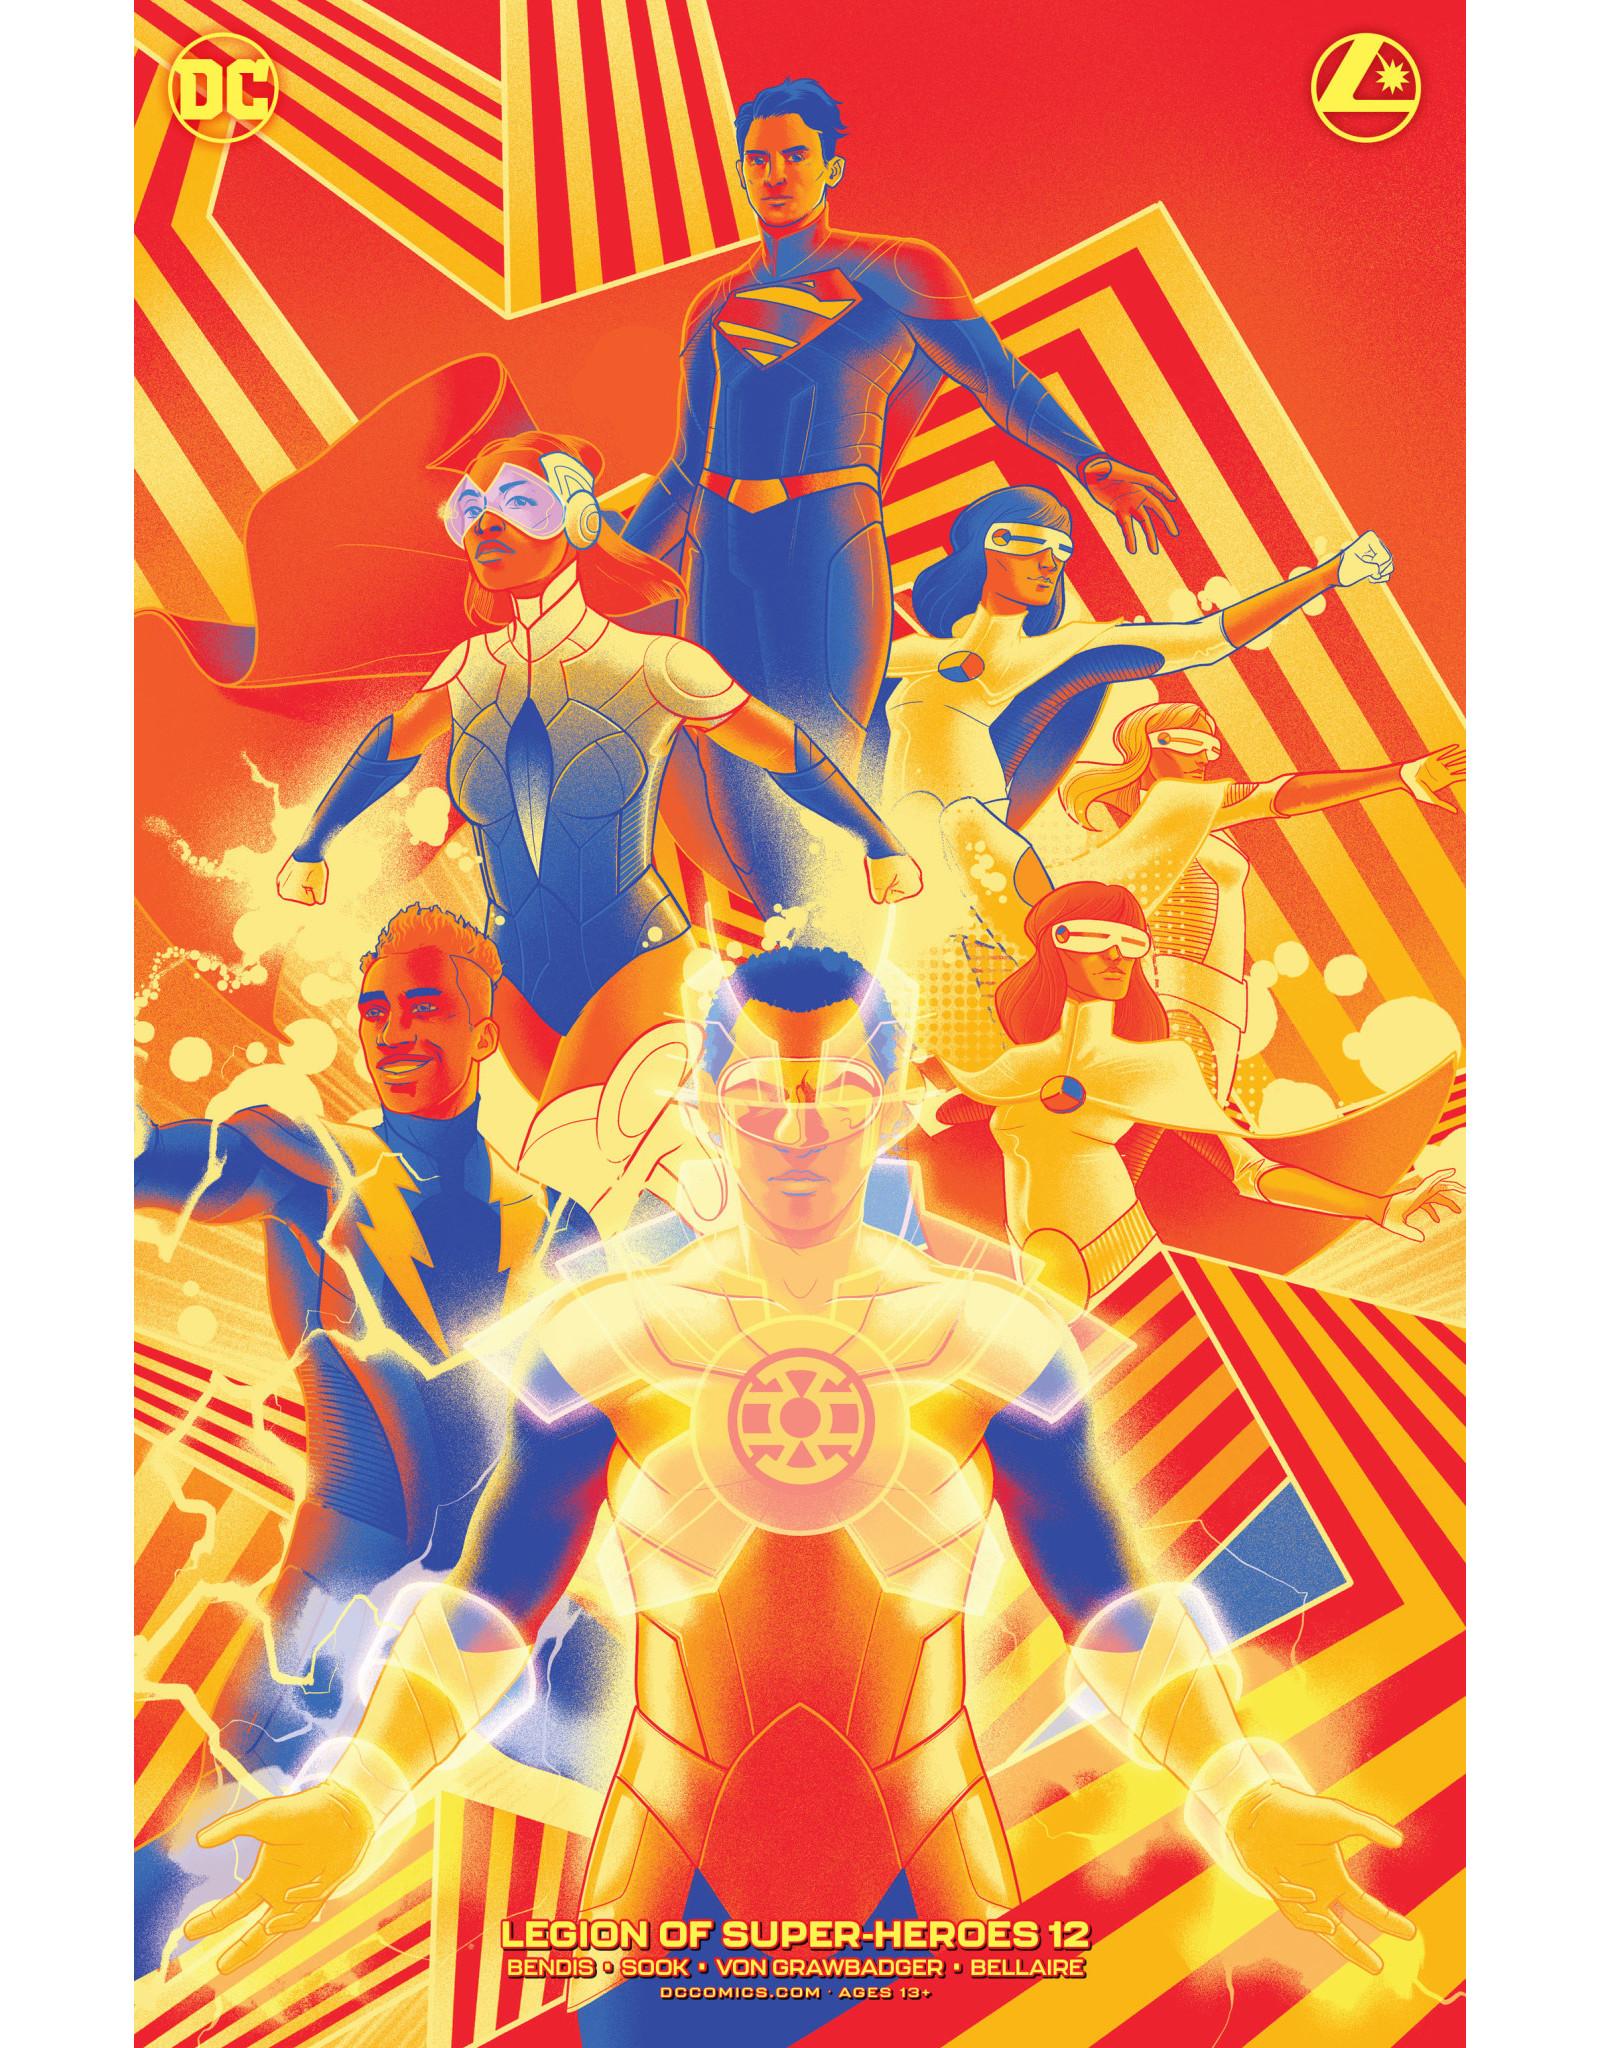 DC Comics LEGION OF SUPER-HEROES #12 CVR B MATT TAYLOR VAR